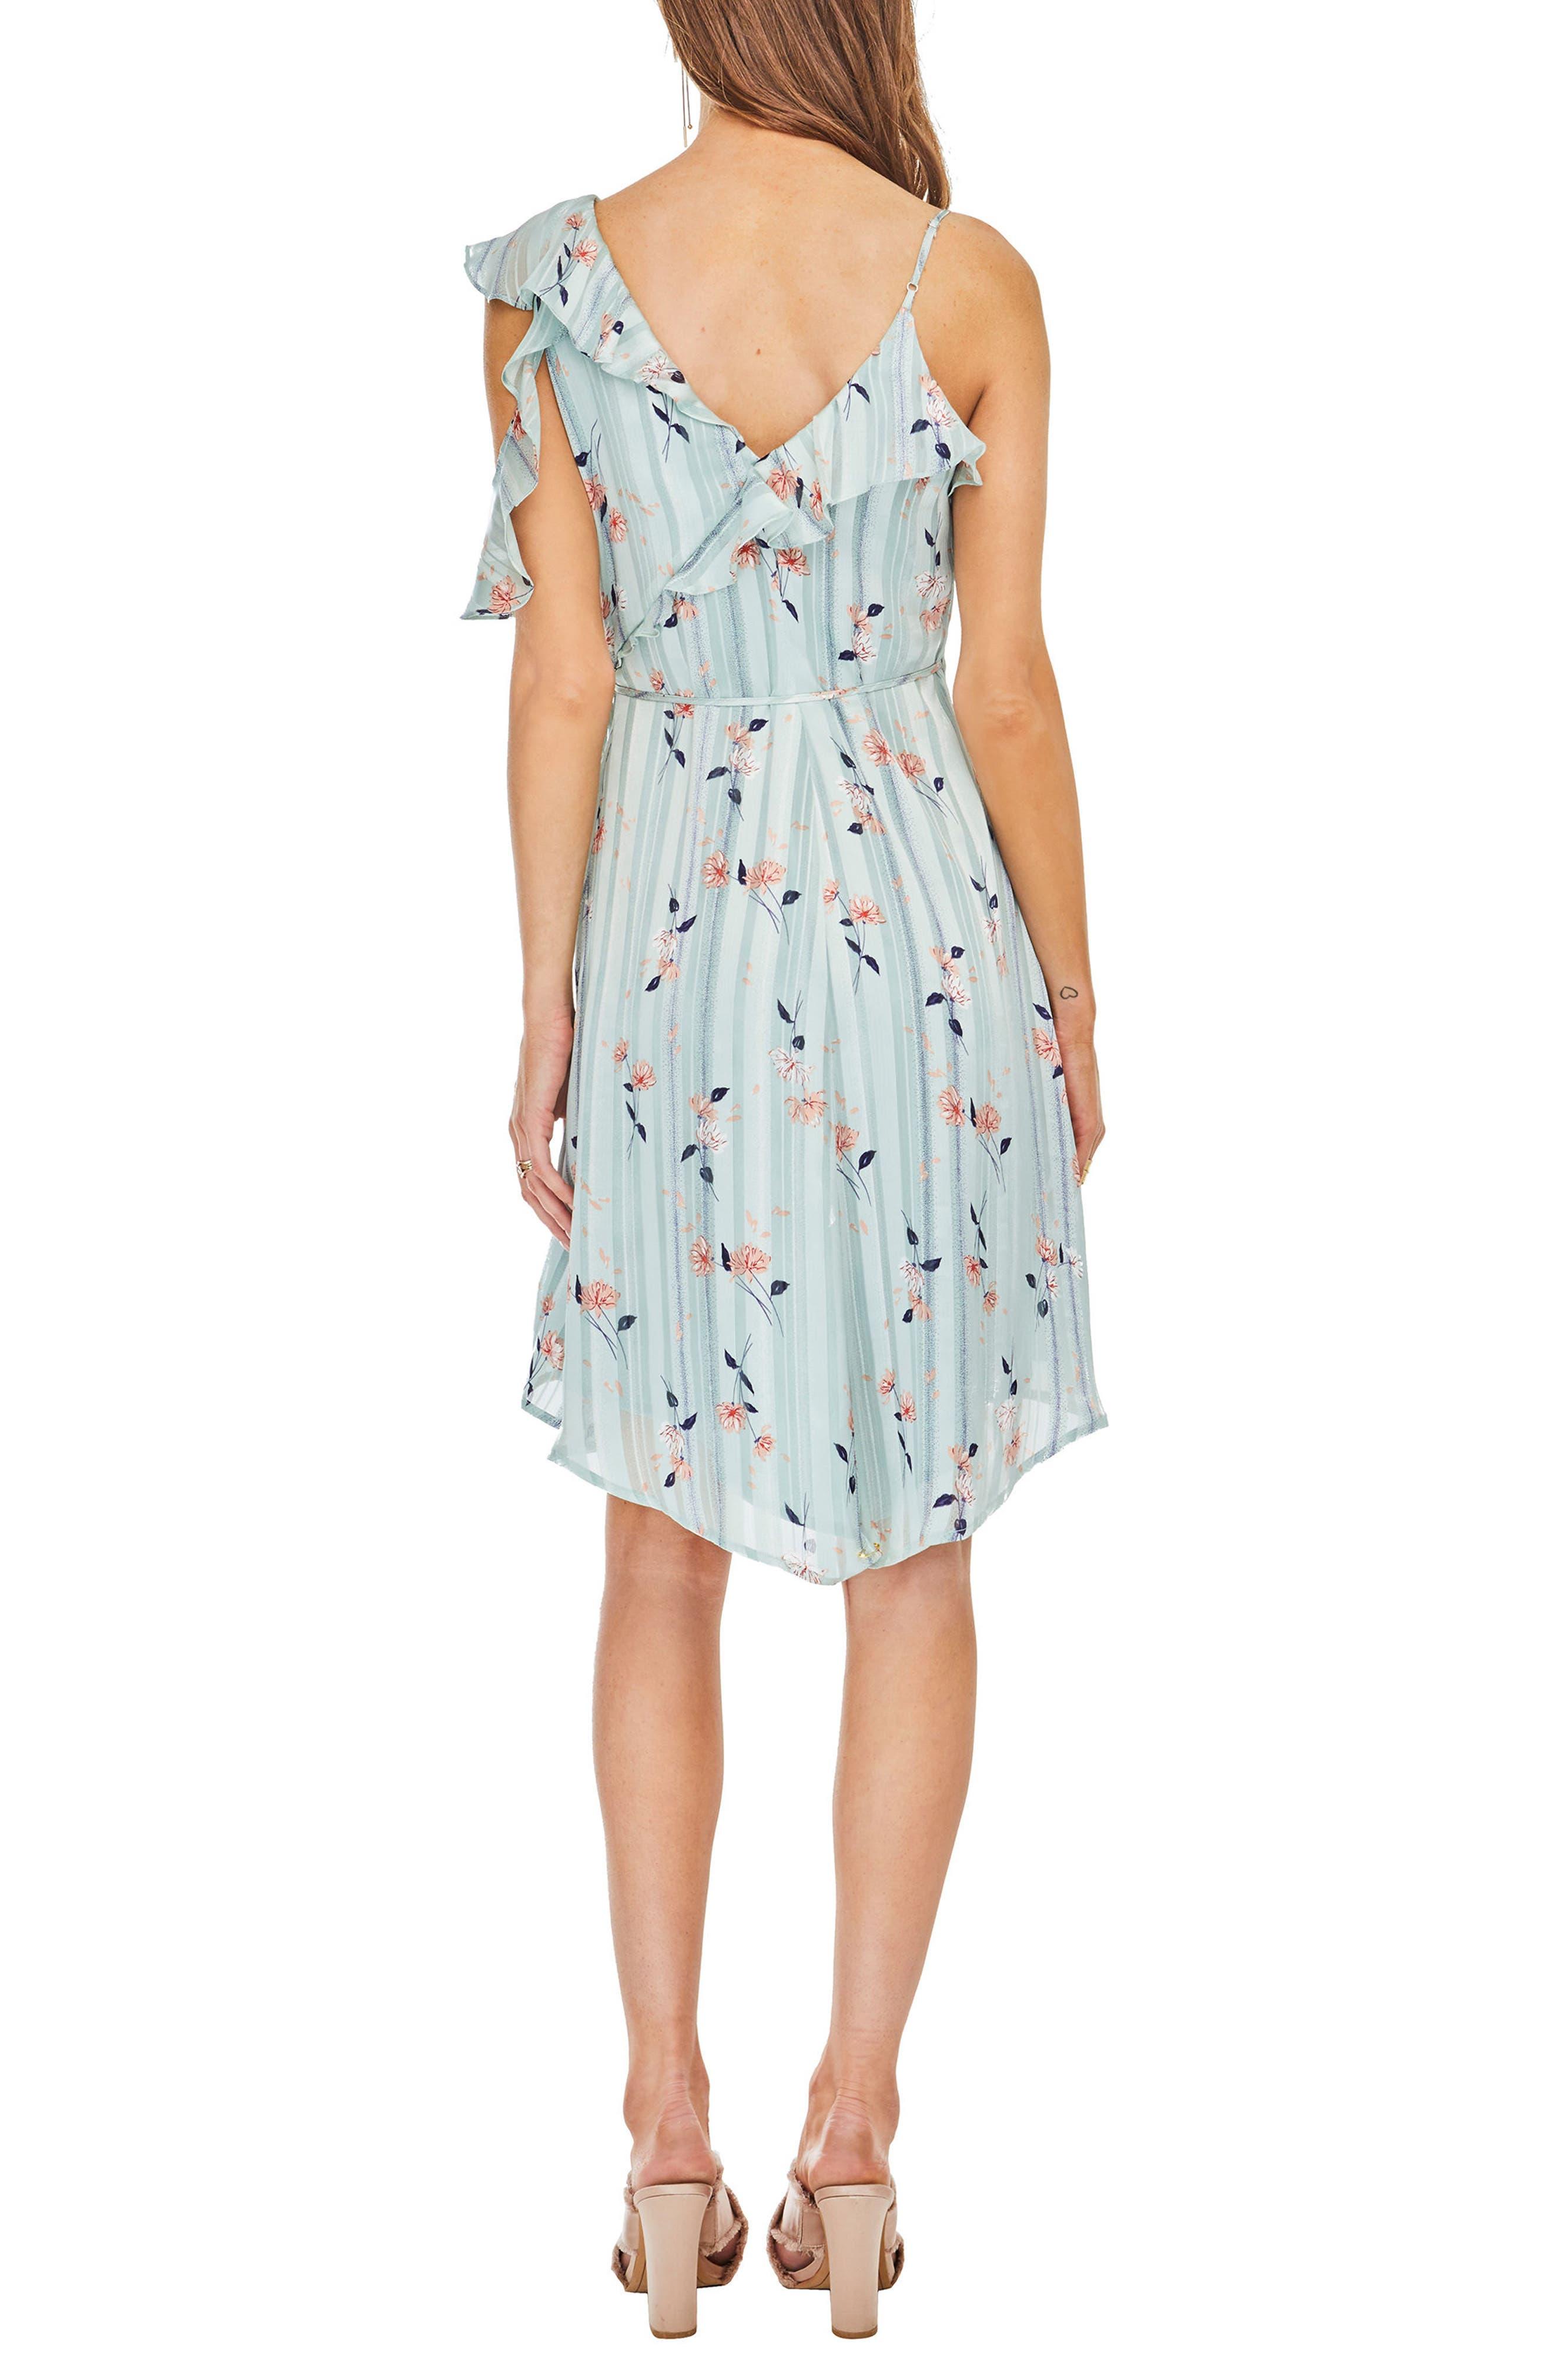 Josie Ruffle Dress,                             Alternate thumbnail 2, color,                             Mint Satin Floral